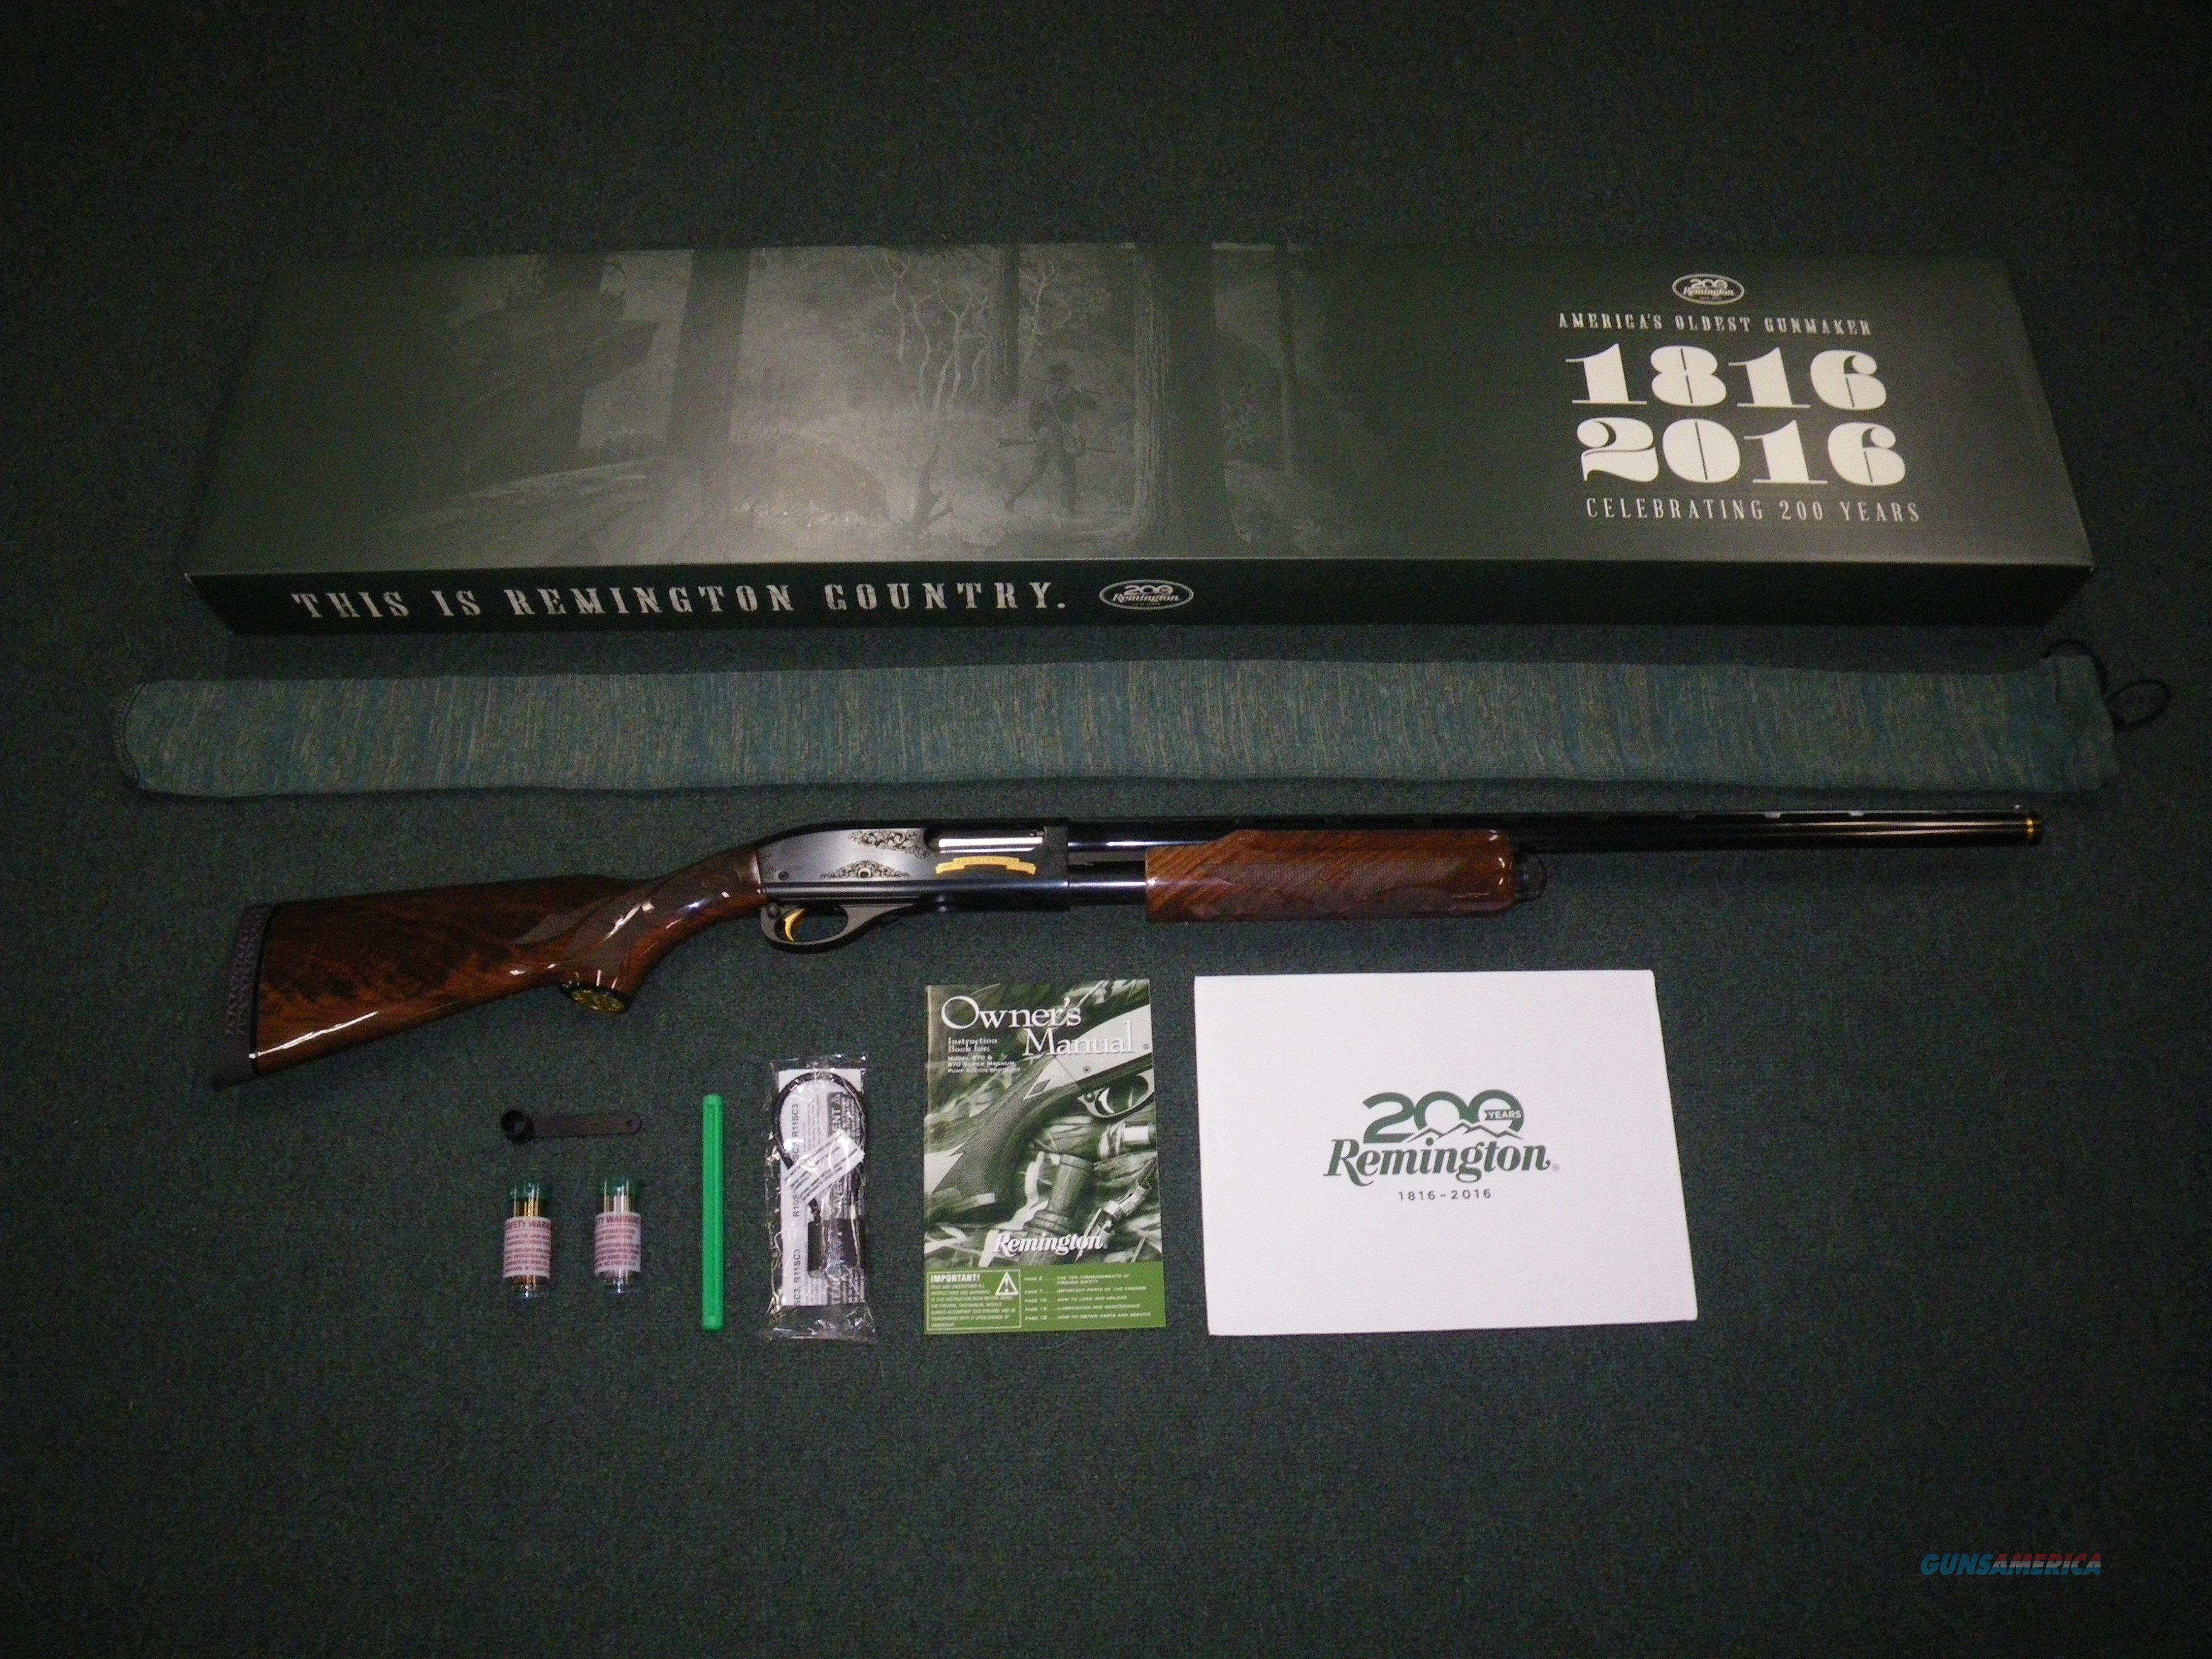 remington 870 wingmaster 200th anniv 12ga 26 n for sale rh gunsamerica com Remington 870 Wingmaster Serial Number Remington Wingmaster 870 16-Gauge